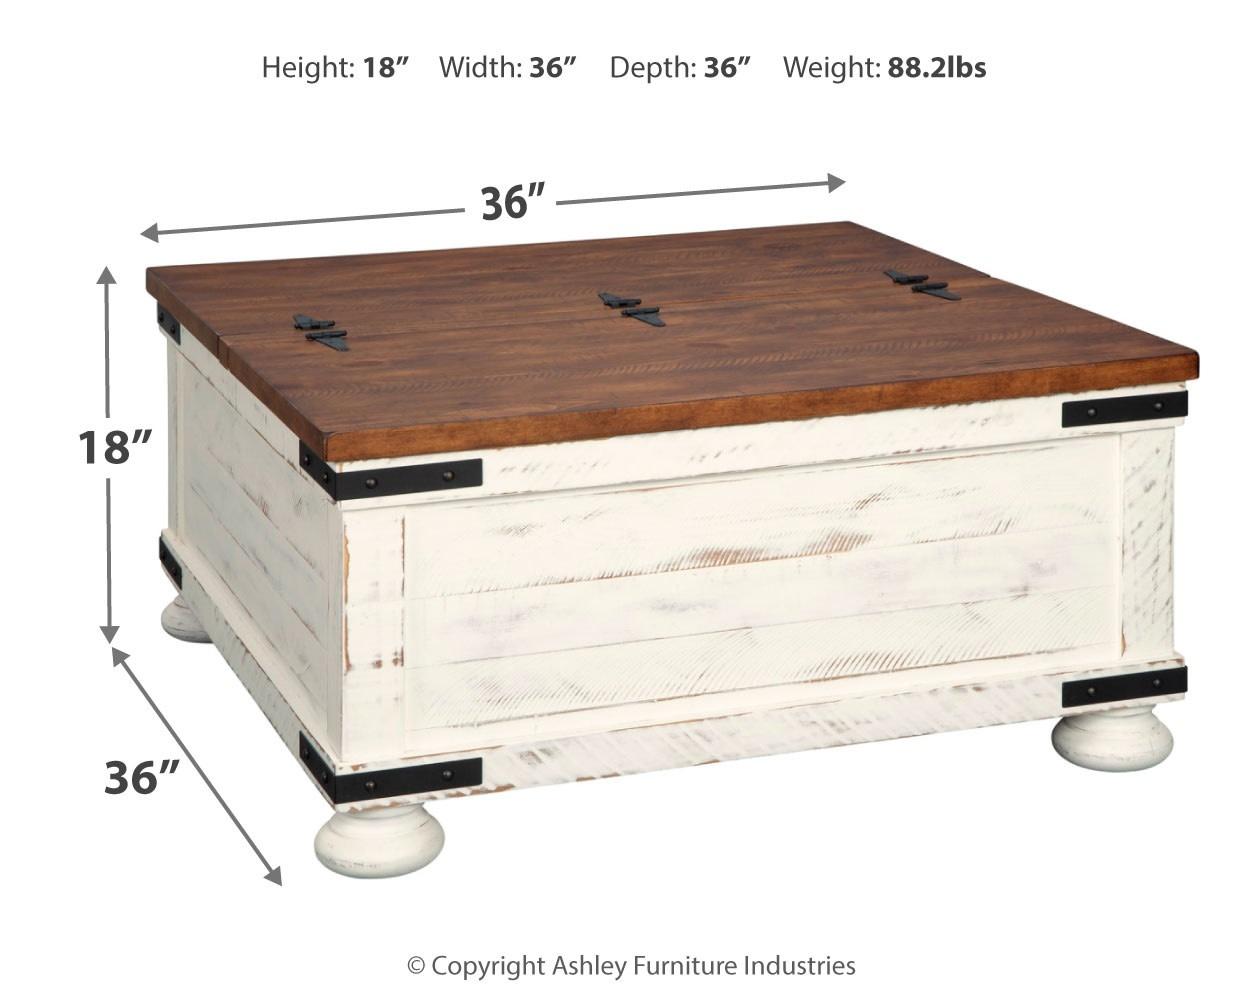 Signature Design Wystfield Cocktail Table w/ Storage- White/Brown- T459-20